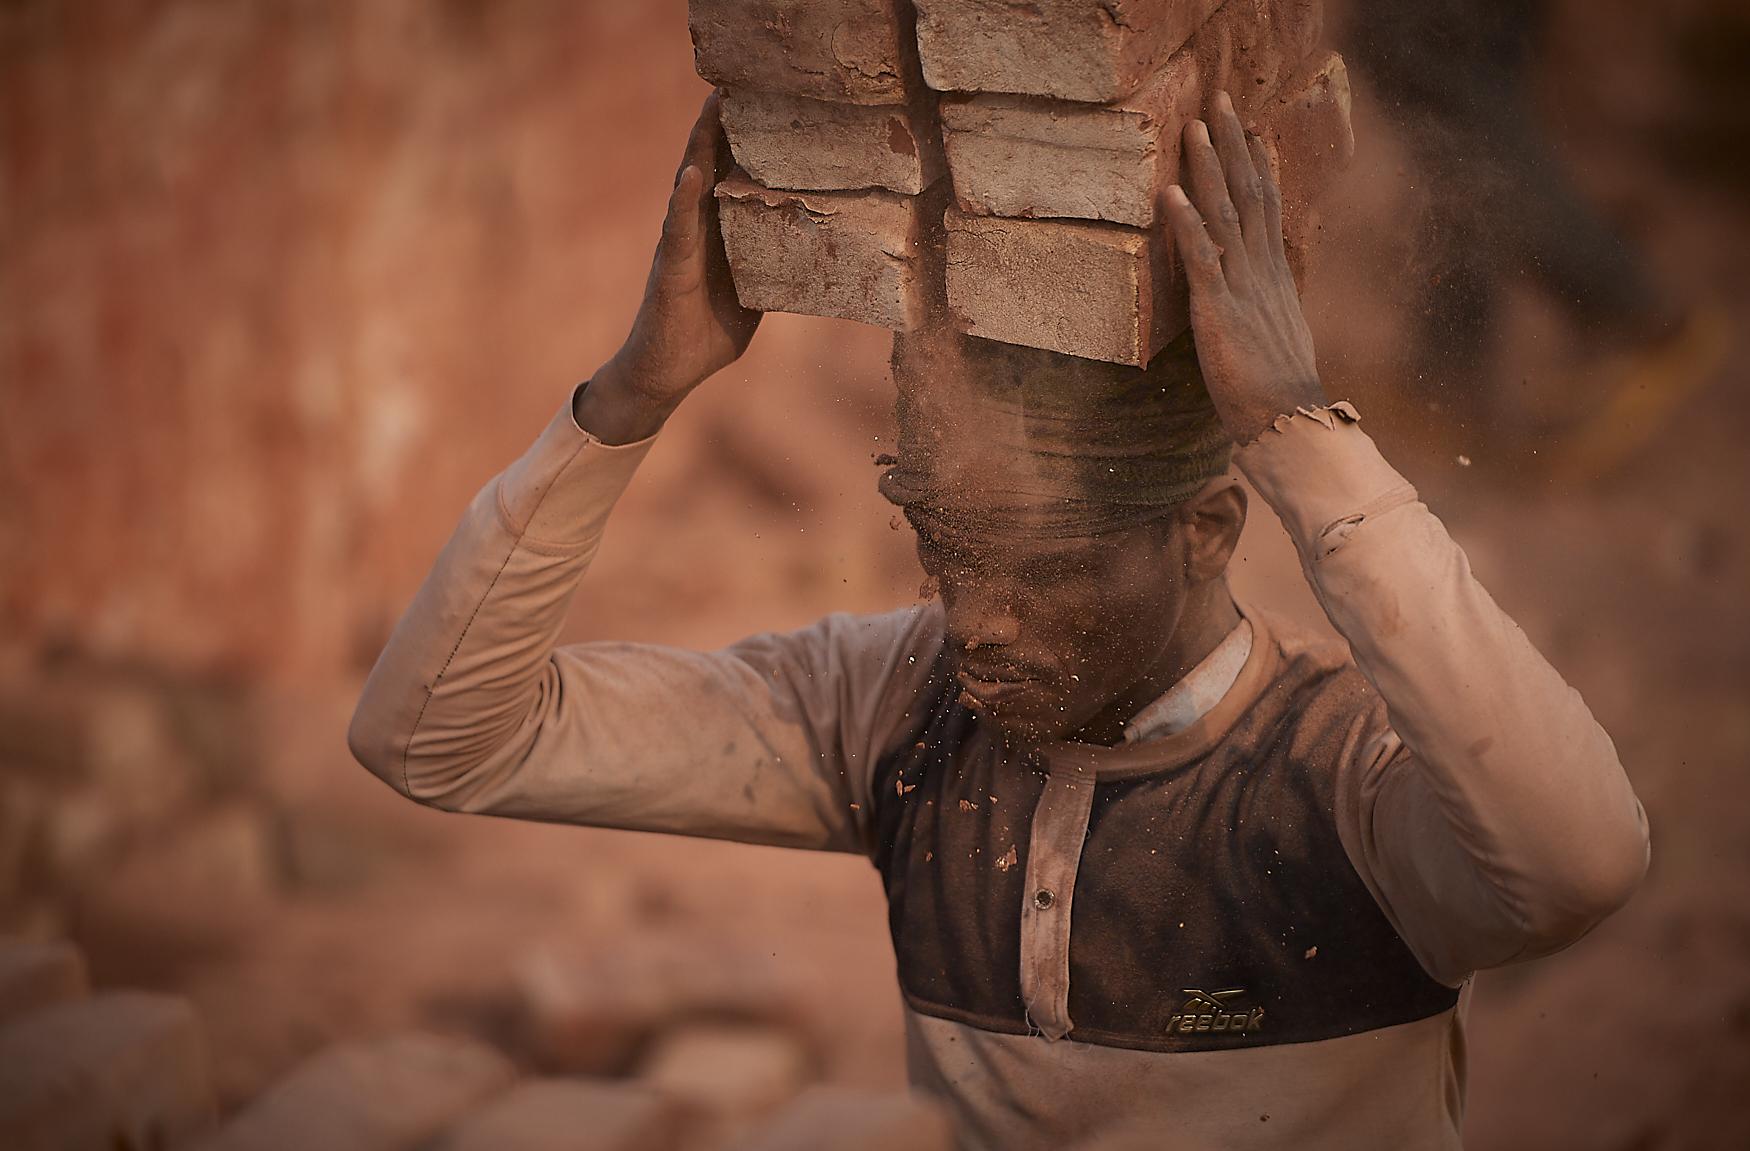 bangladeshi brick factory worker